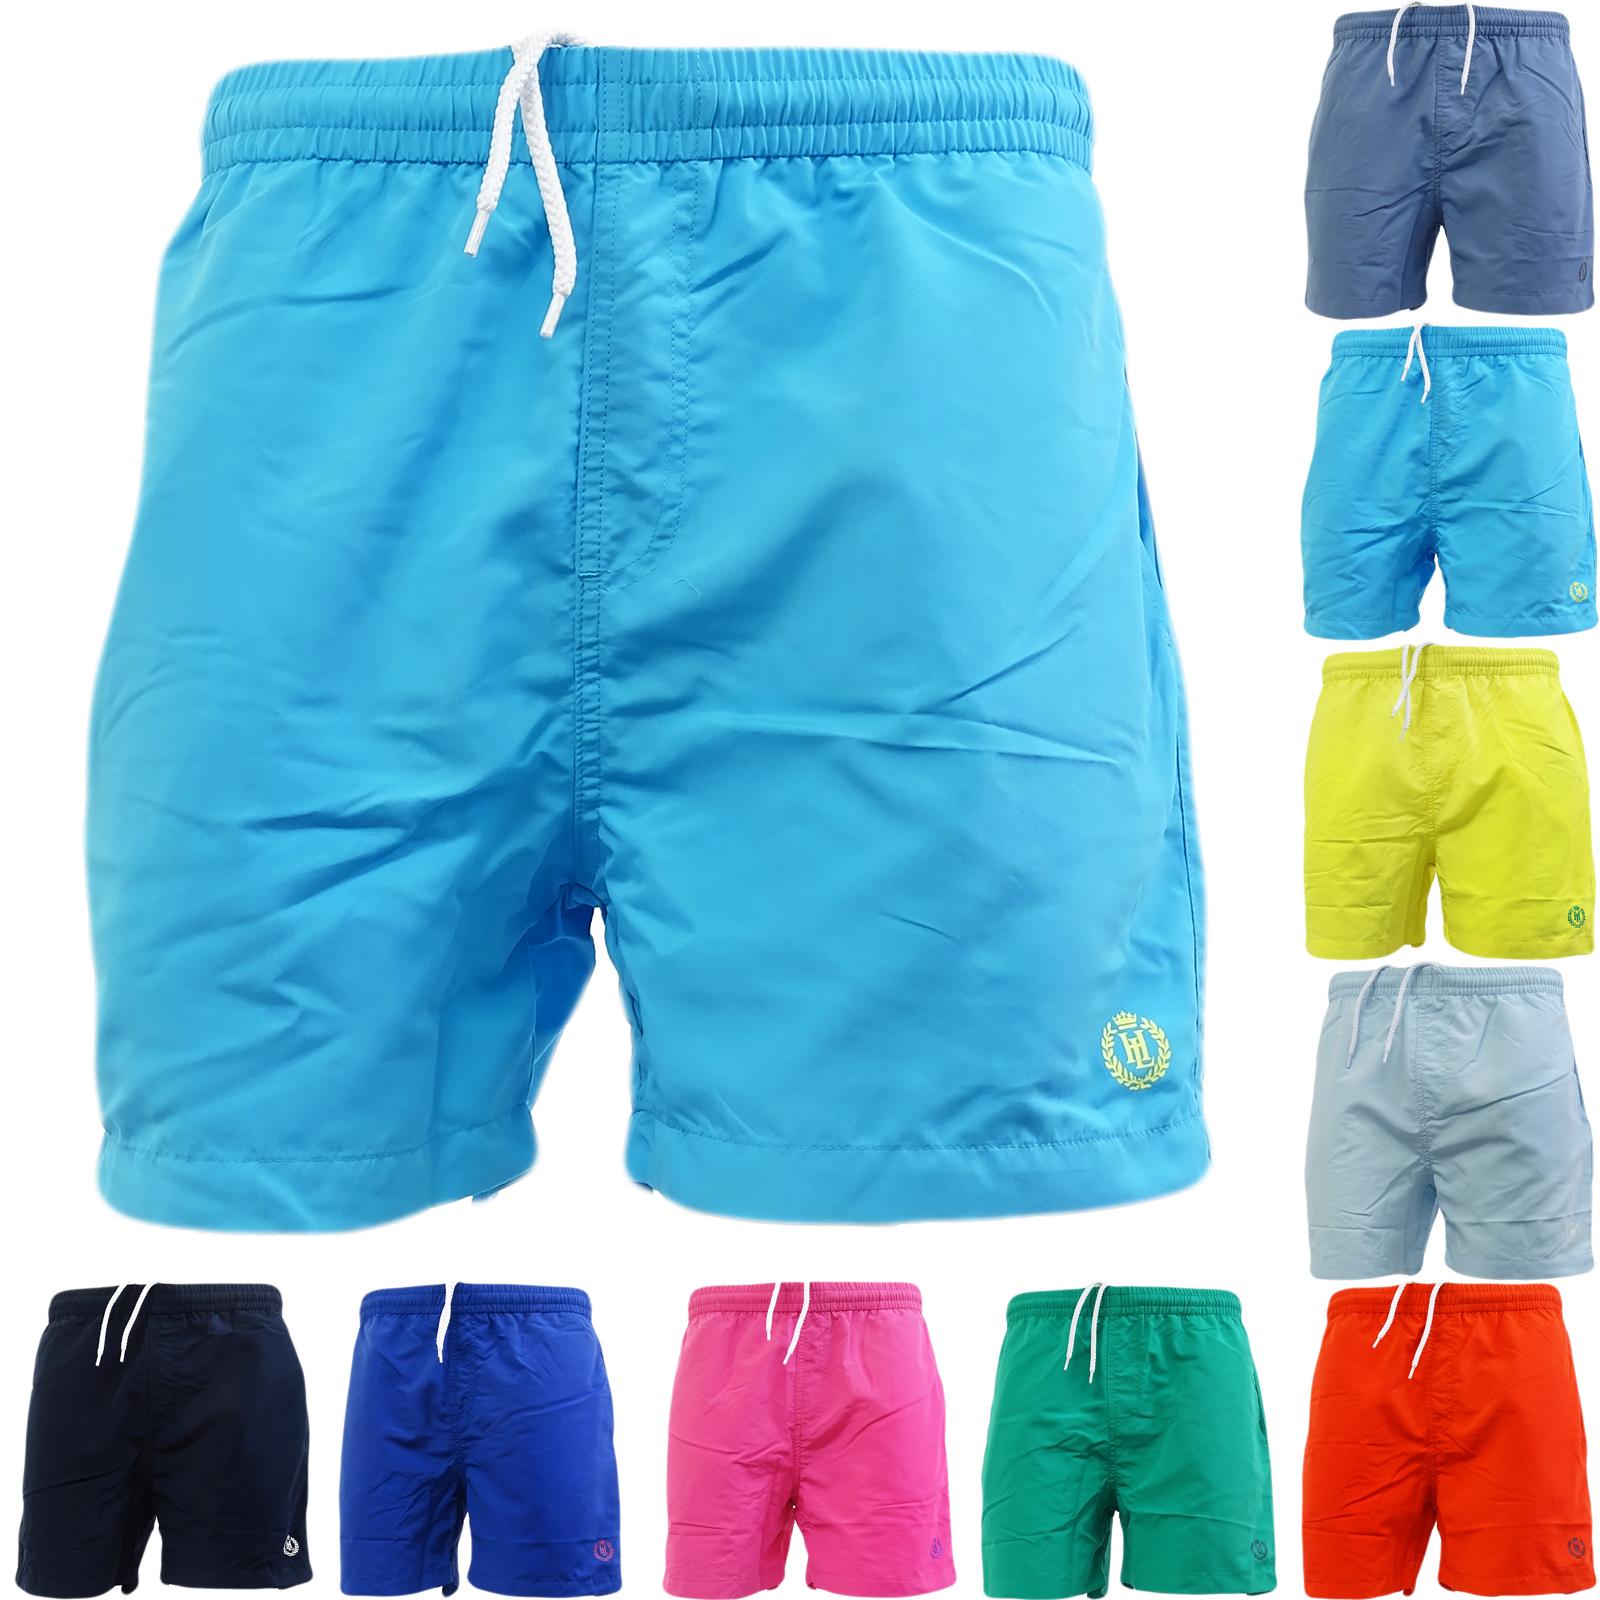 Henri Lloyd Short Length Swim Shorts With Mesh Lining Shorts Brixham 18